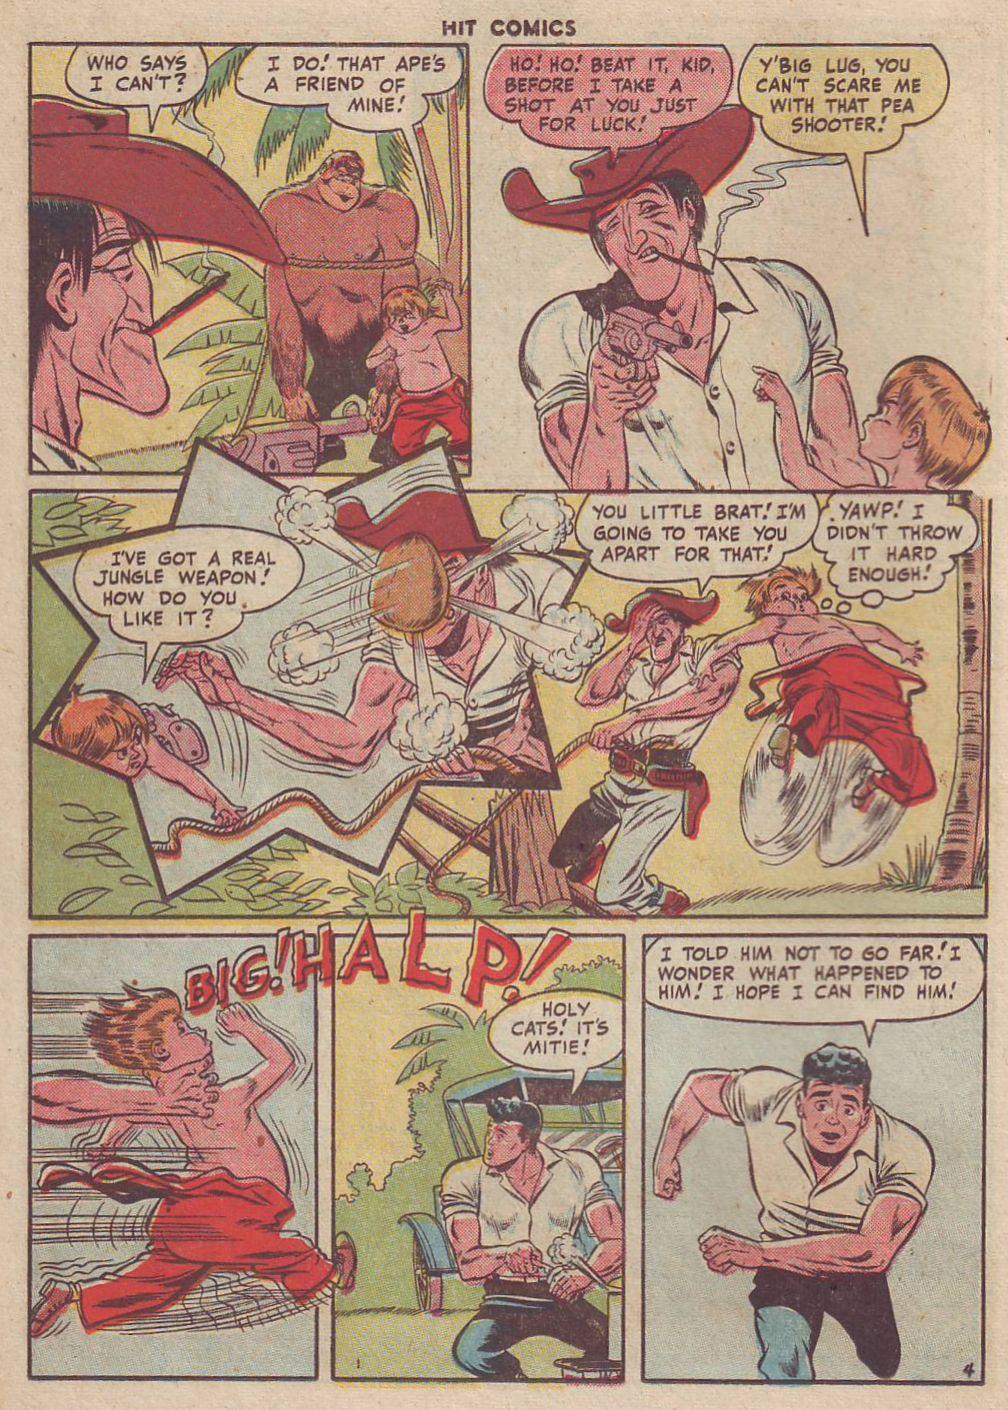 Read online Hit Comics comic -  Issue #51 - 24